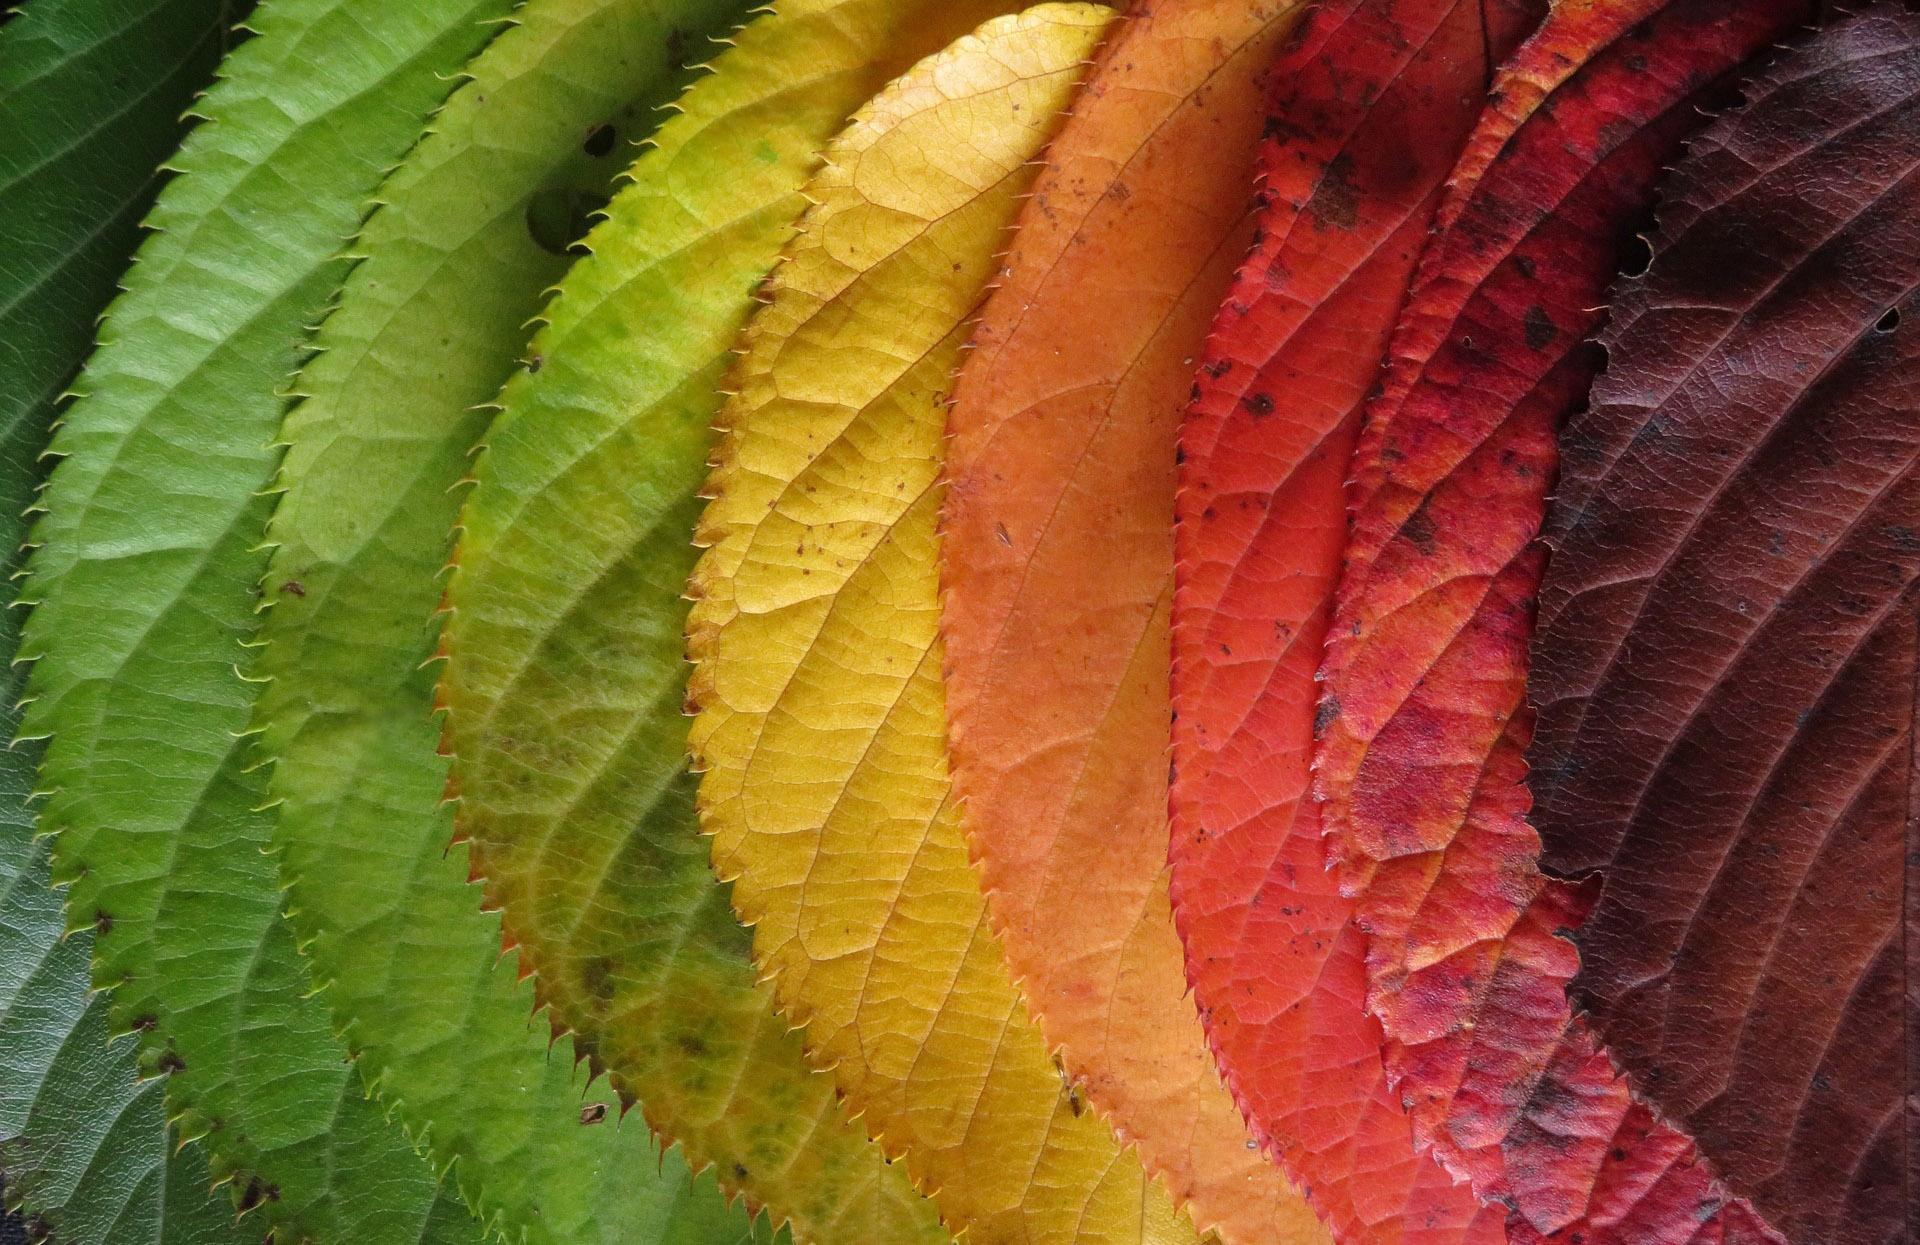 Flourish as a Change Catalyst